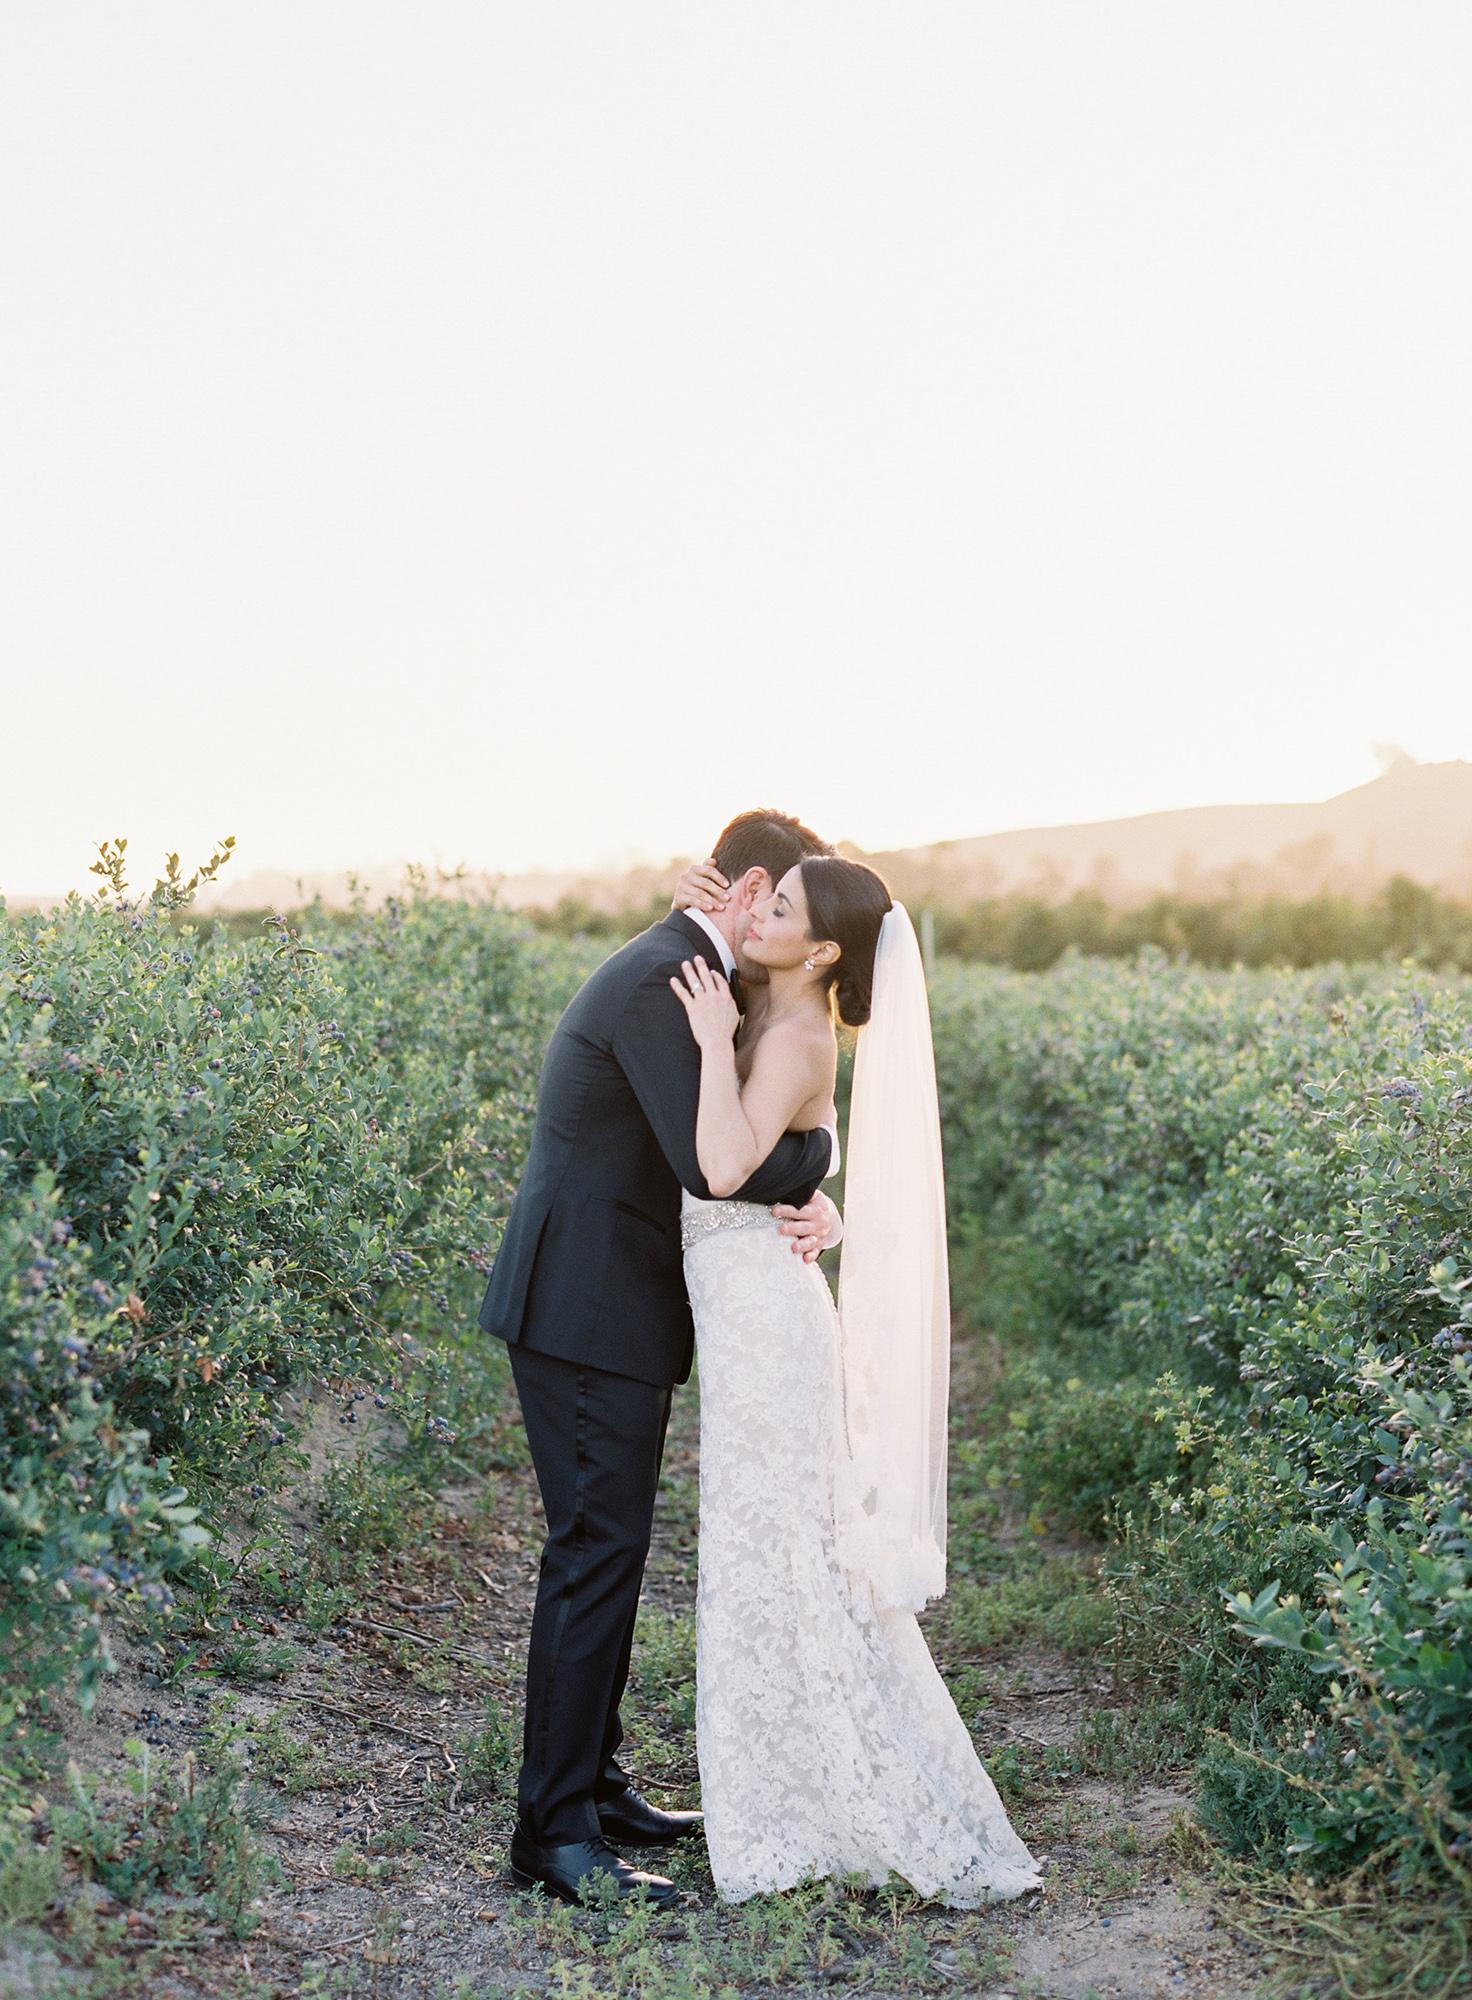 Gerry-Ranch-Wedding-Photography-Kristina-Adams-26.jpg